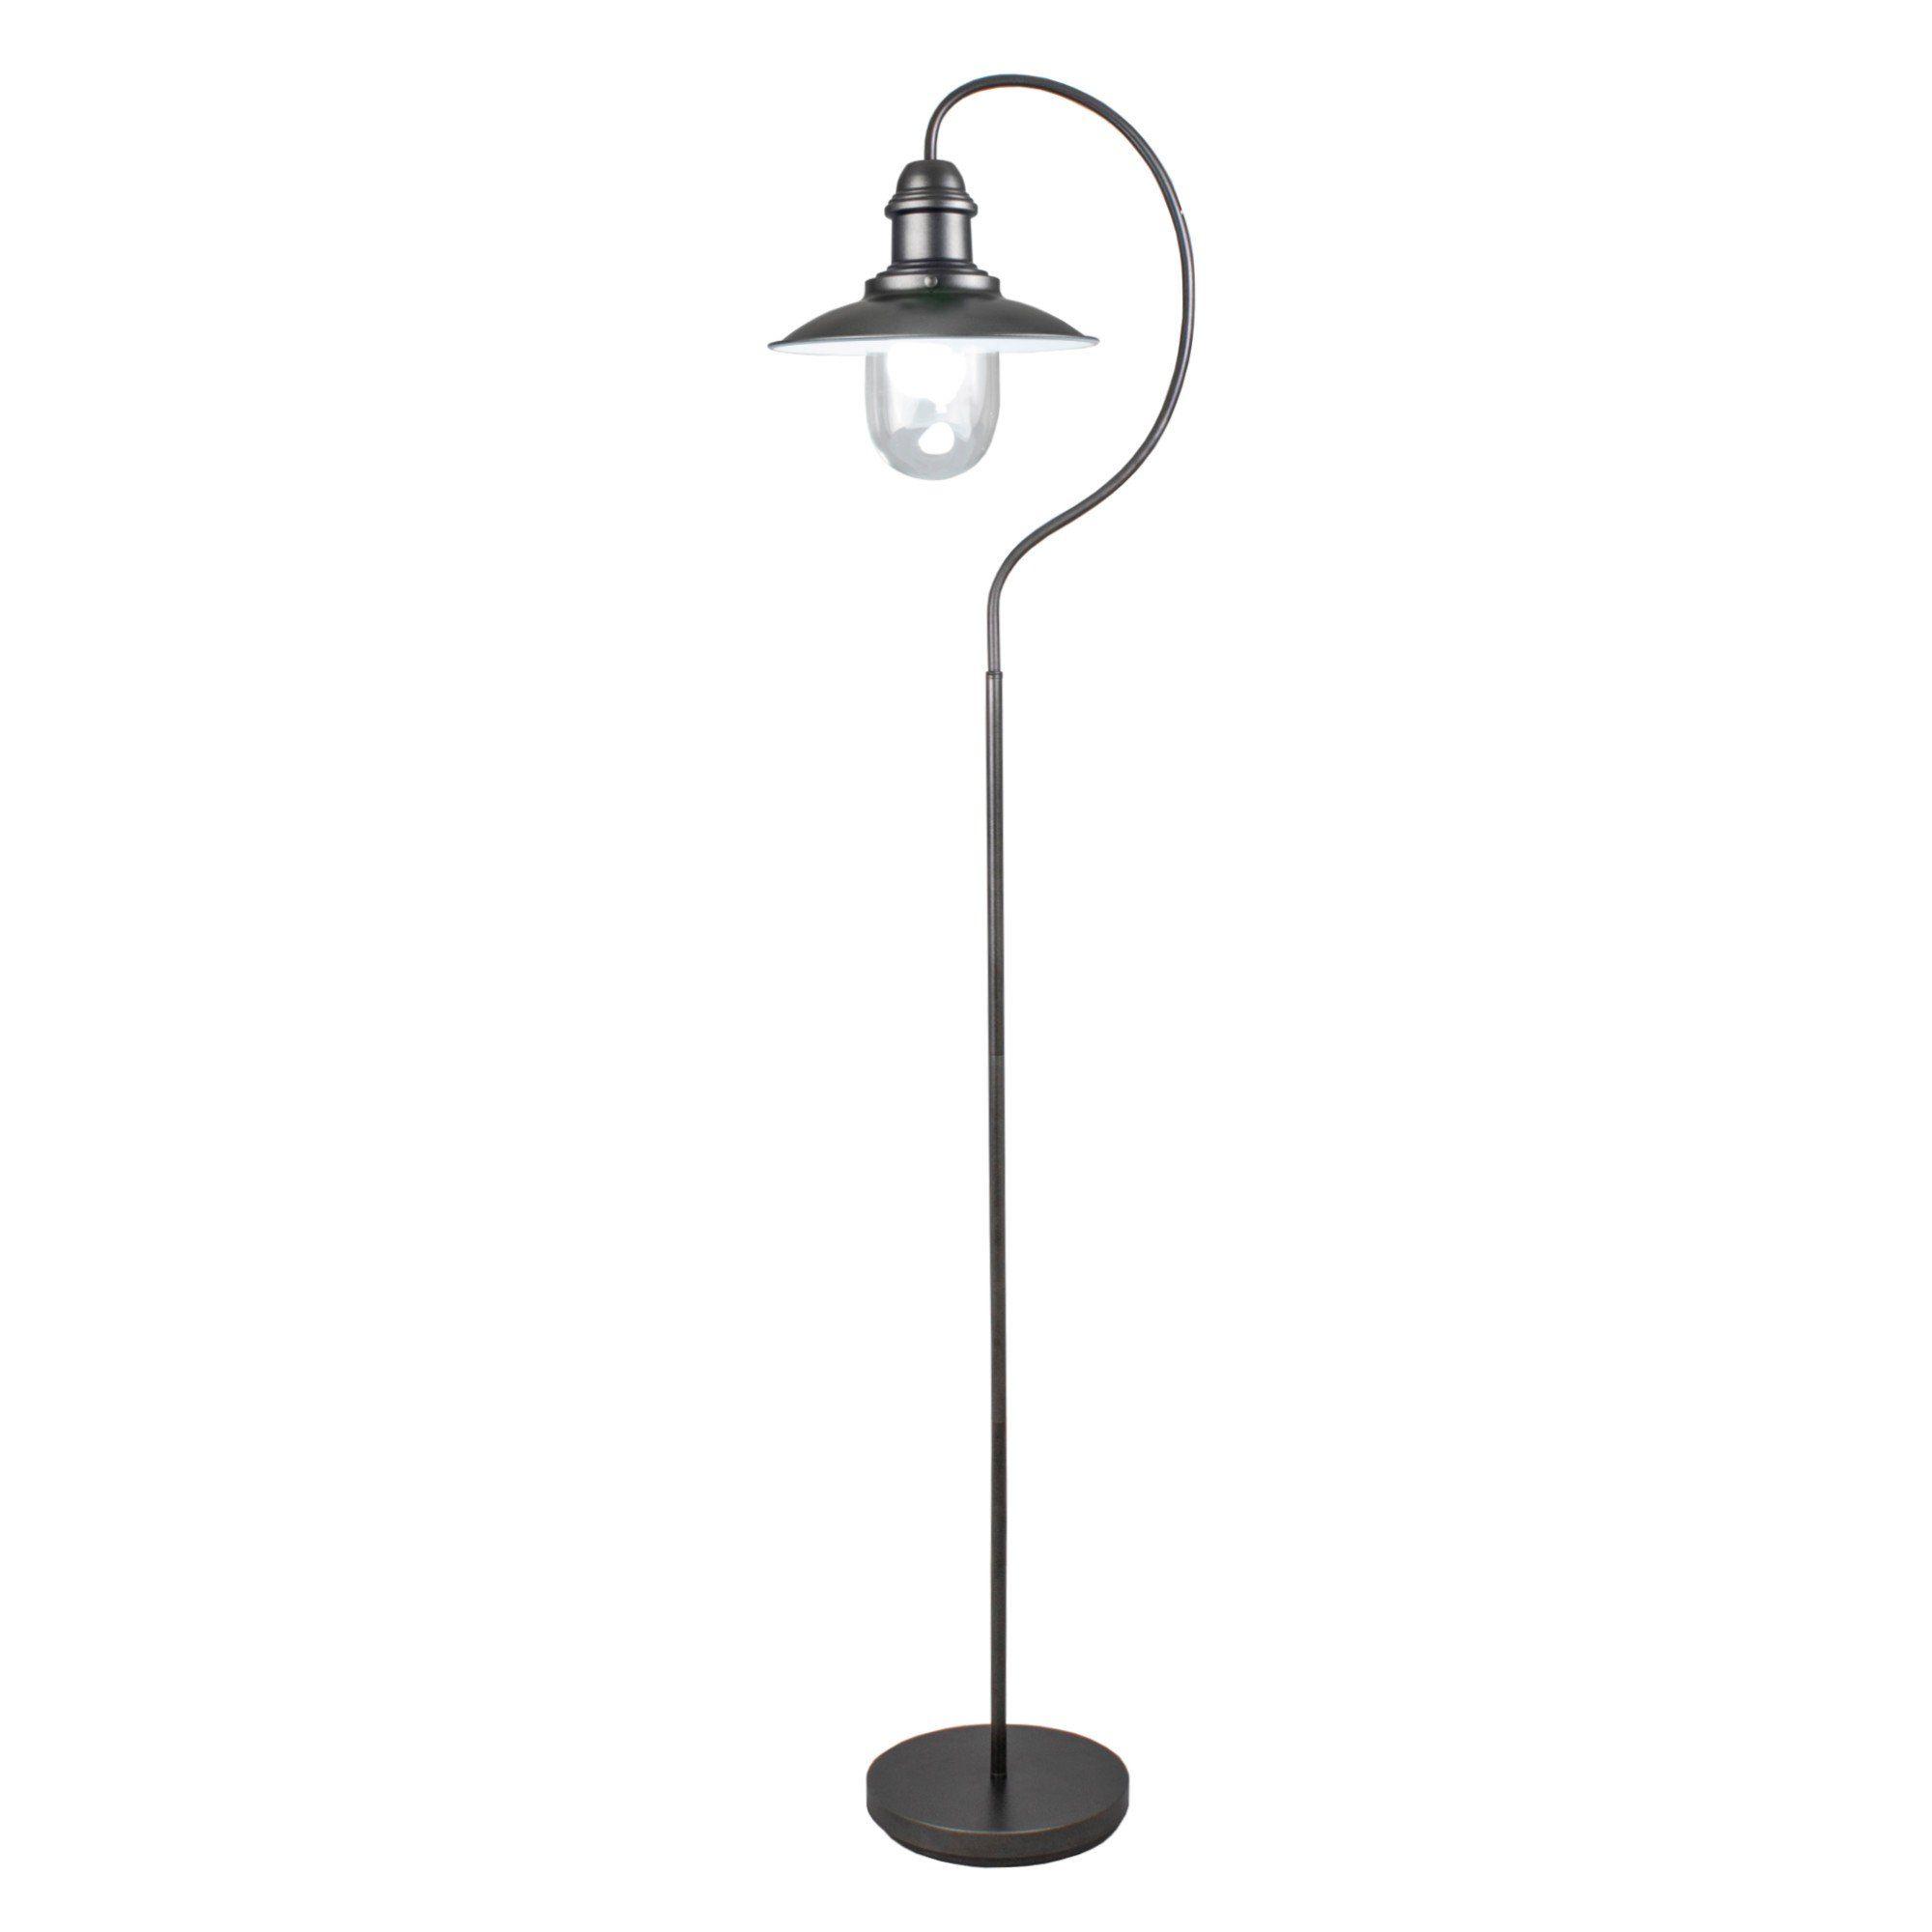 Knot Black Fisherman 158cm Floor Lamp